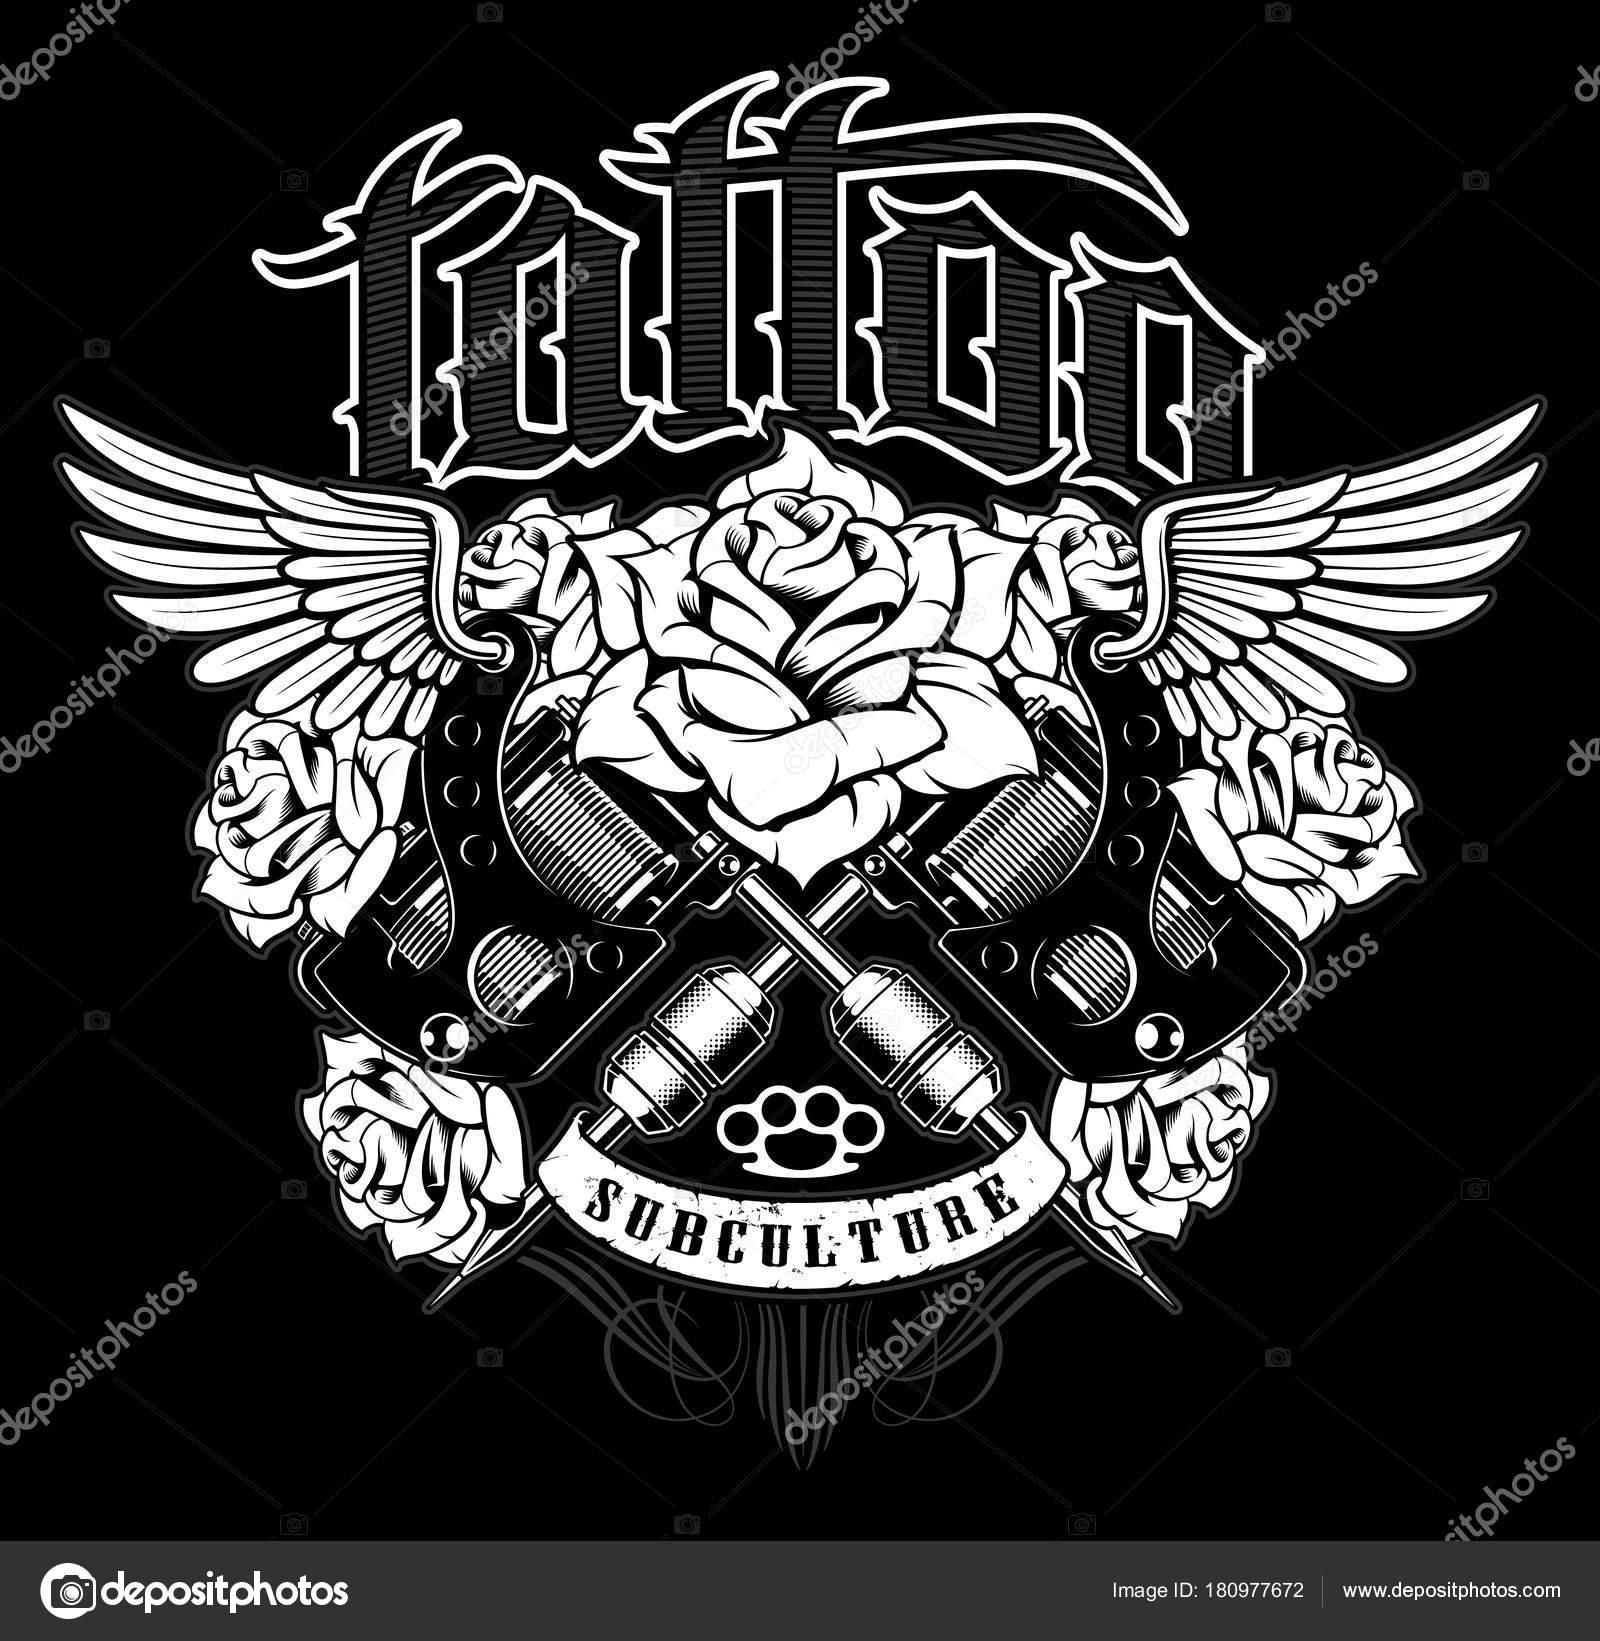 Vectorizado Tattoo Machine Logo Designs Tattoo Shirt Design